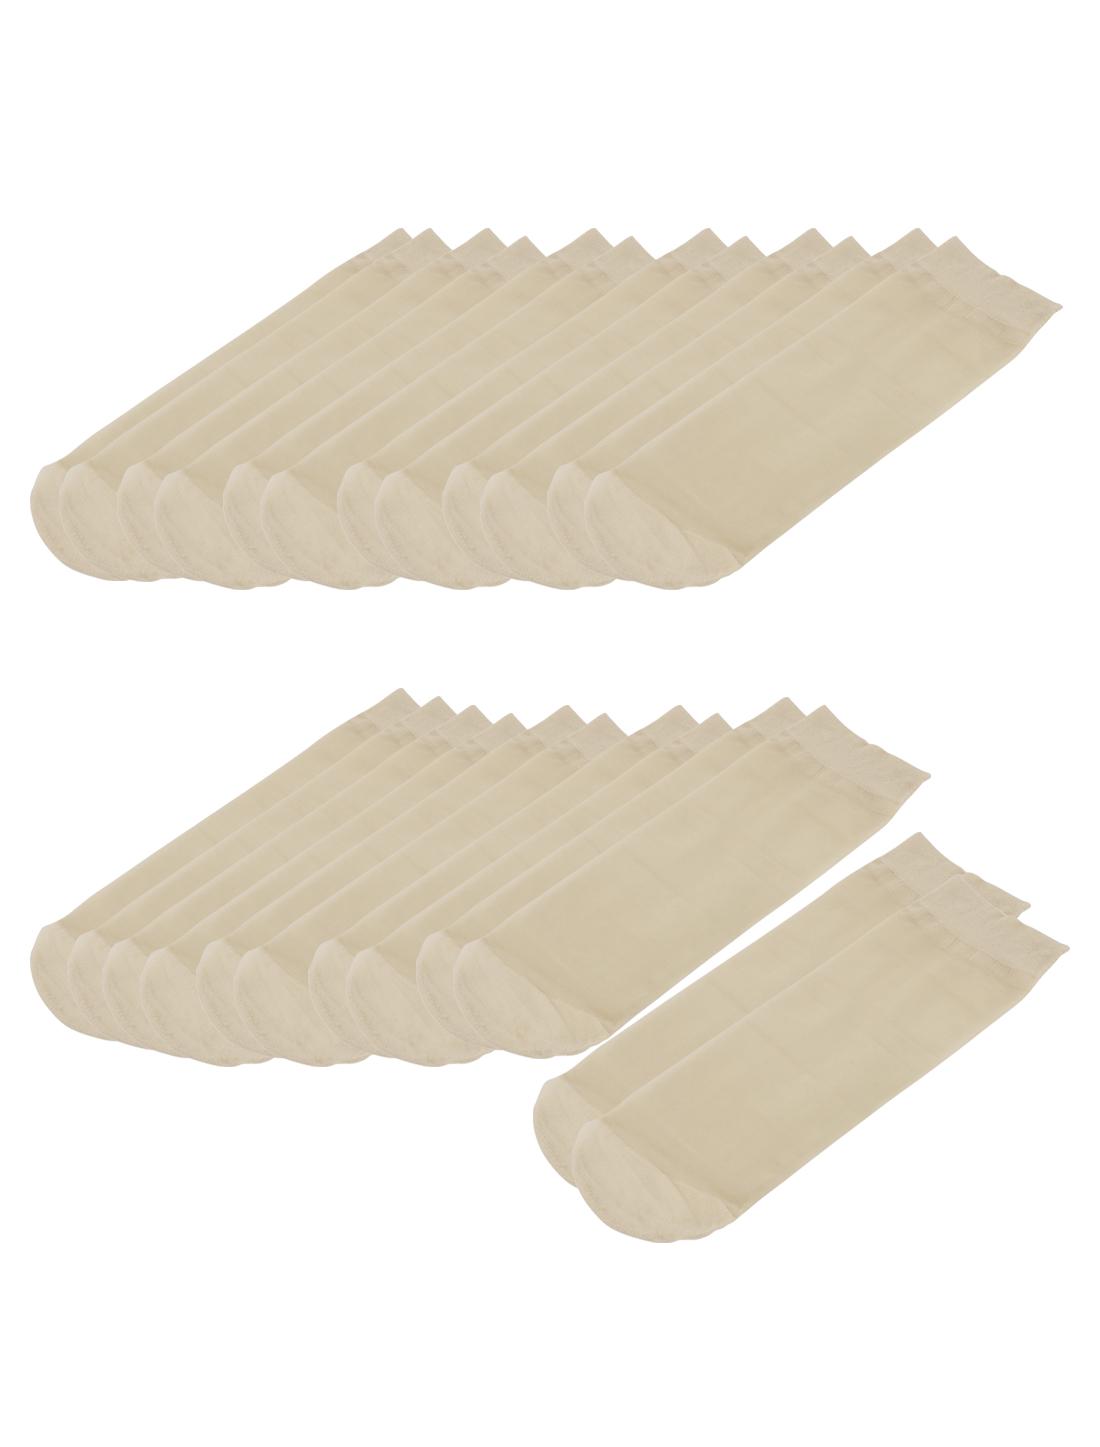 Ladies Summer Breathable Stretch Fabric Sheer Ankle Socks 12 Pairs Skin Beige